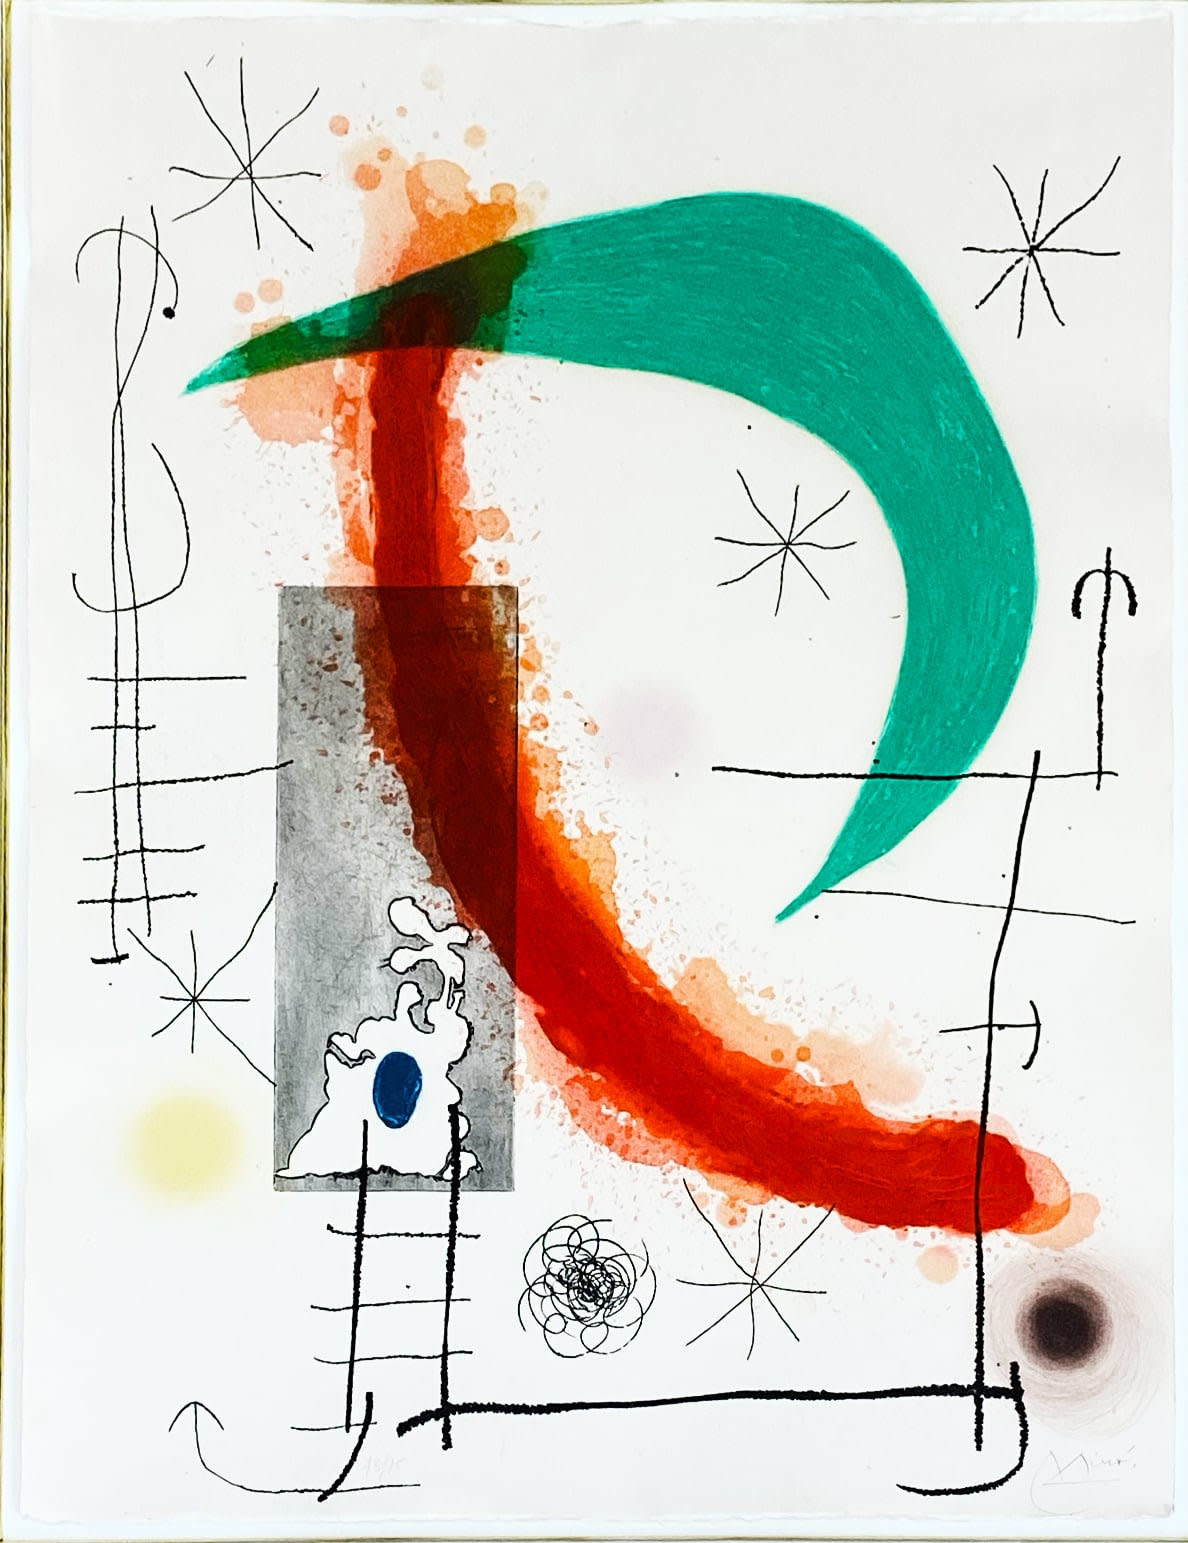 Joan Miro, L'Escalade, 1969